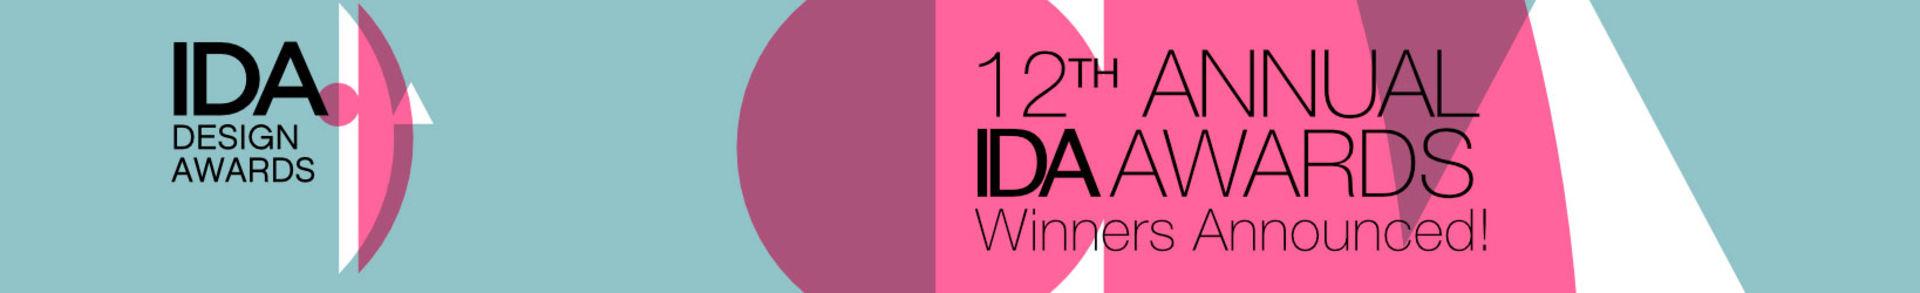 Elica wins two IDA DESIGN AWARDS